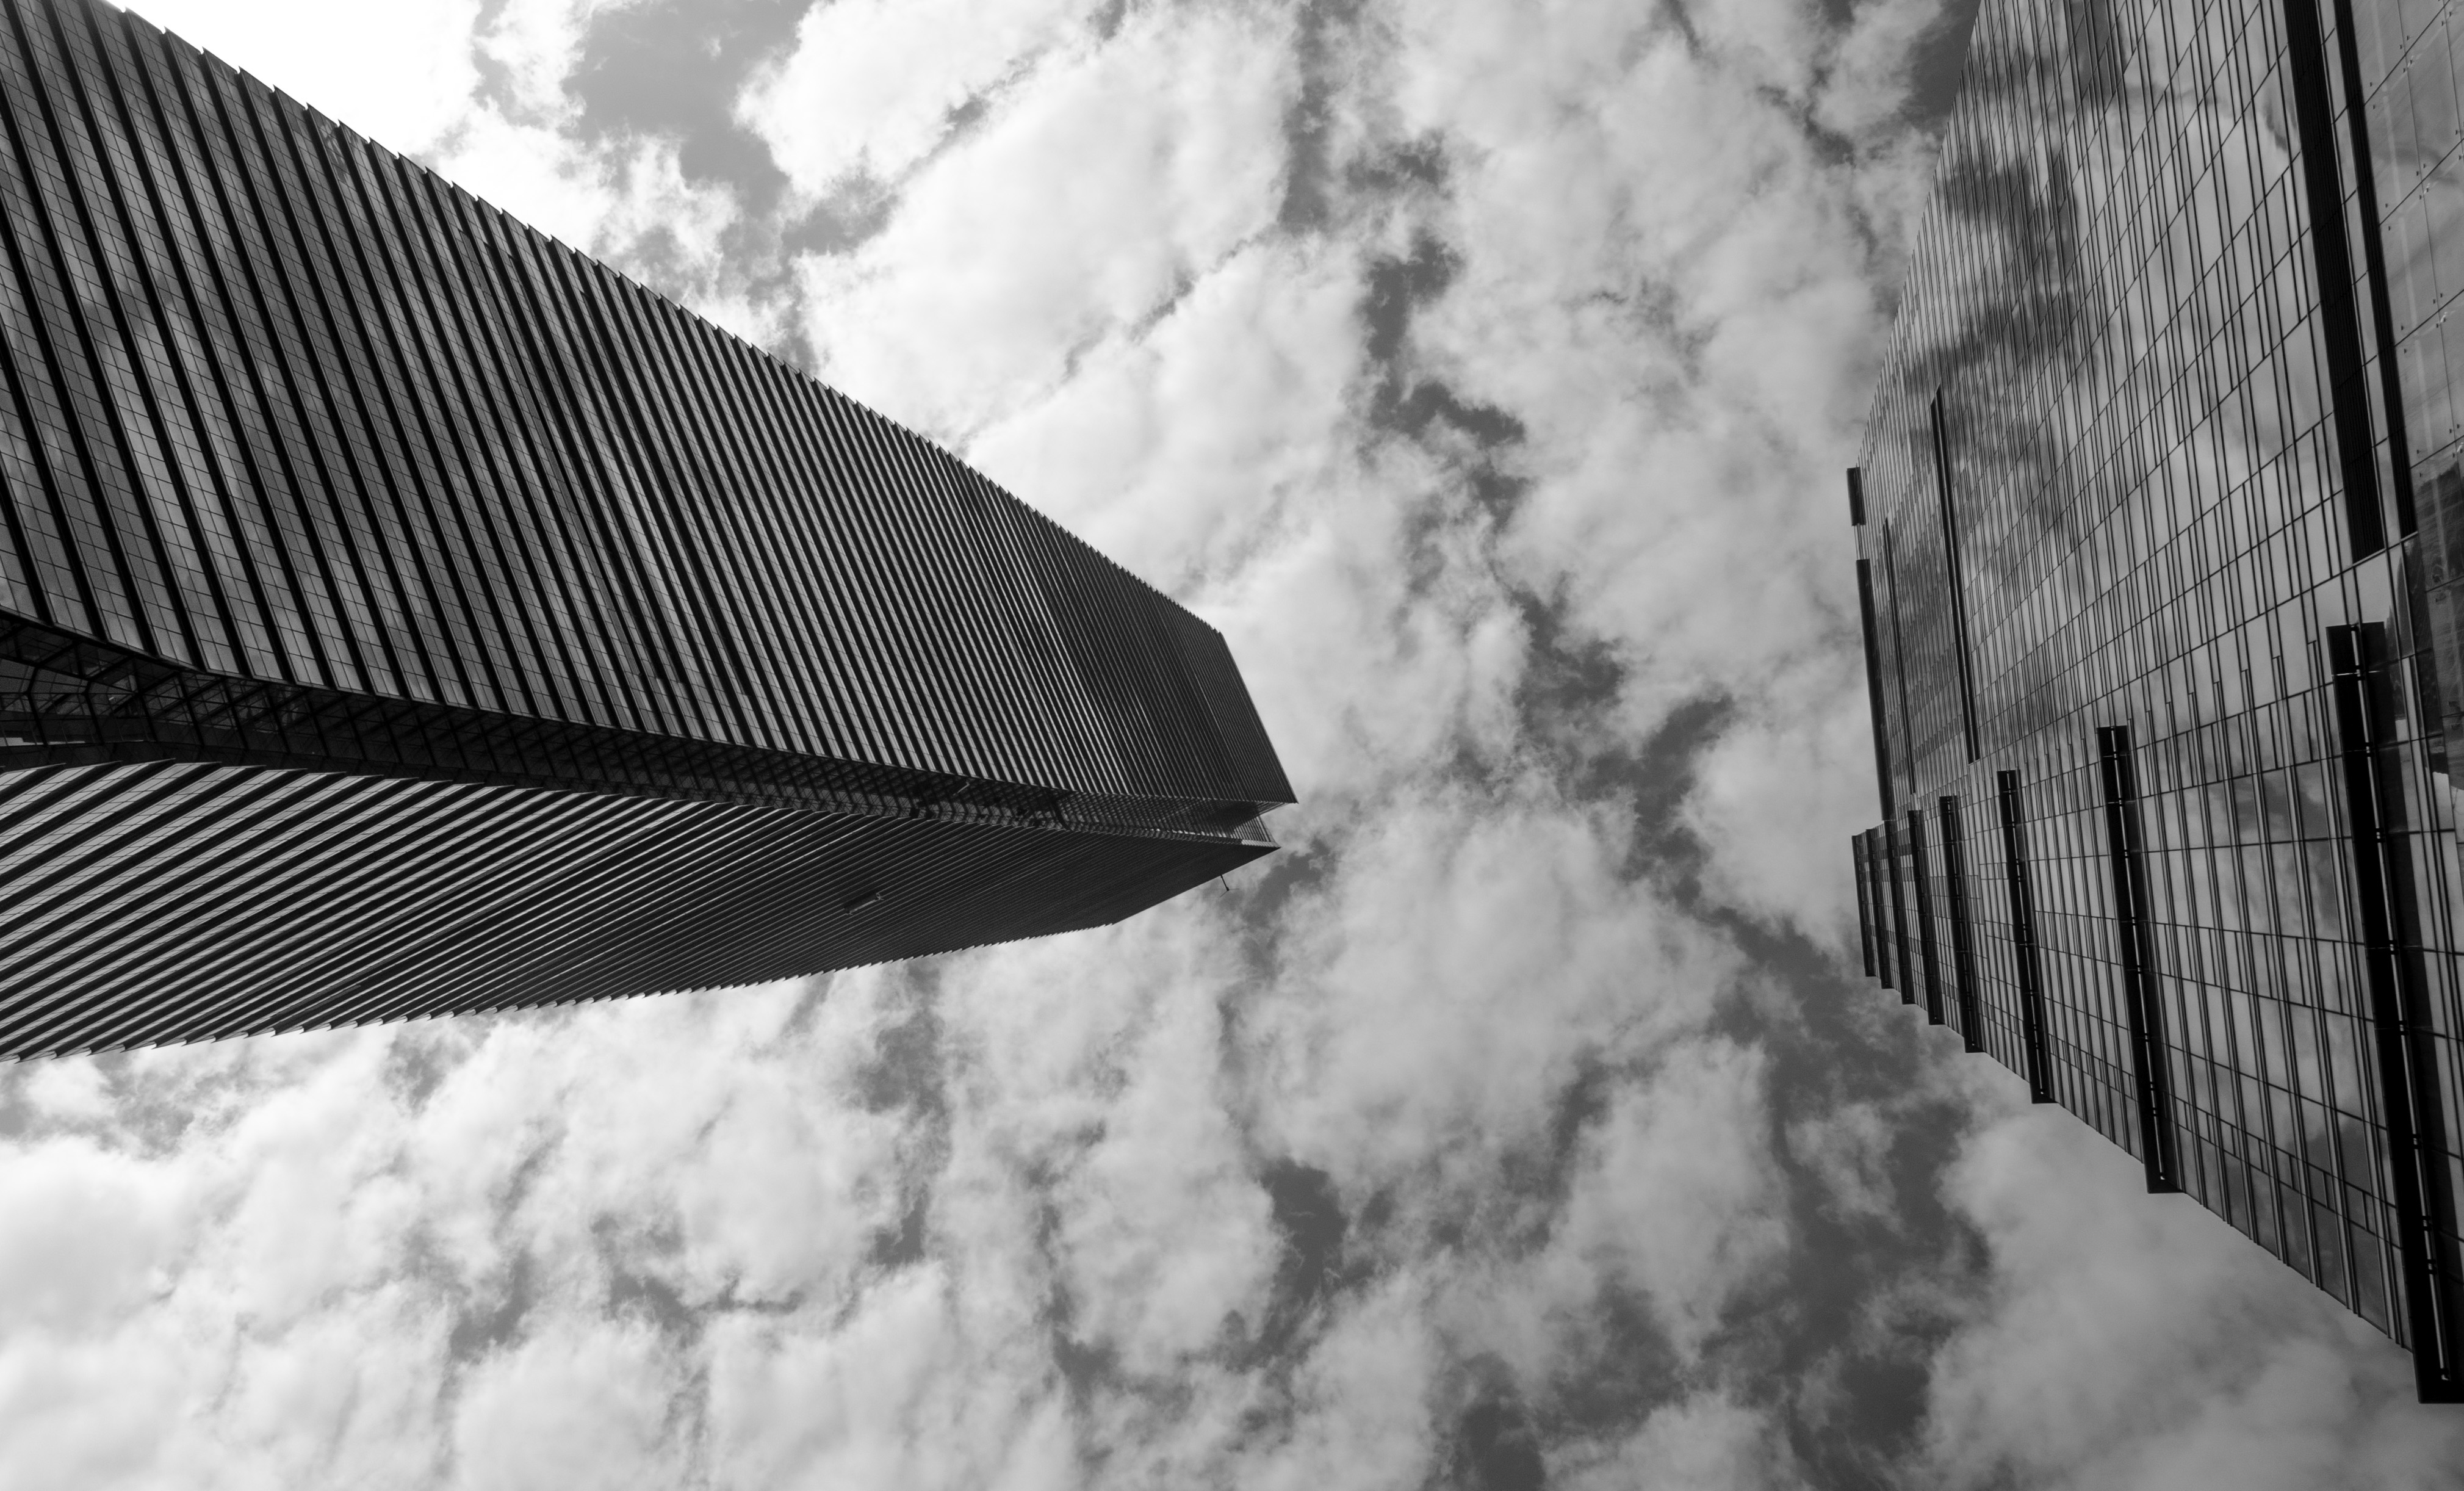 Sky 2012 Hong Kong